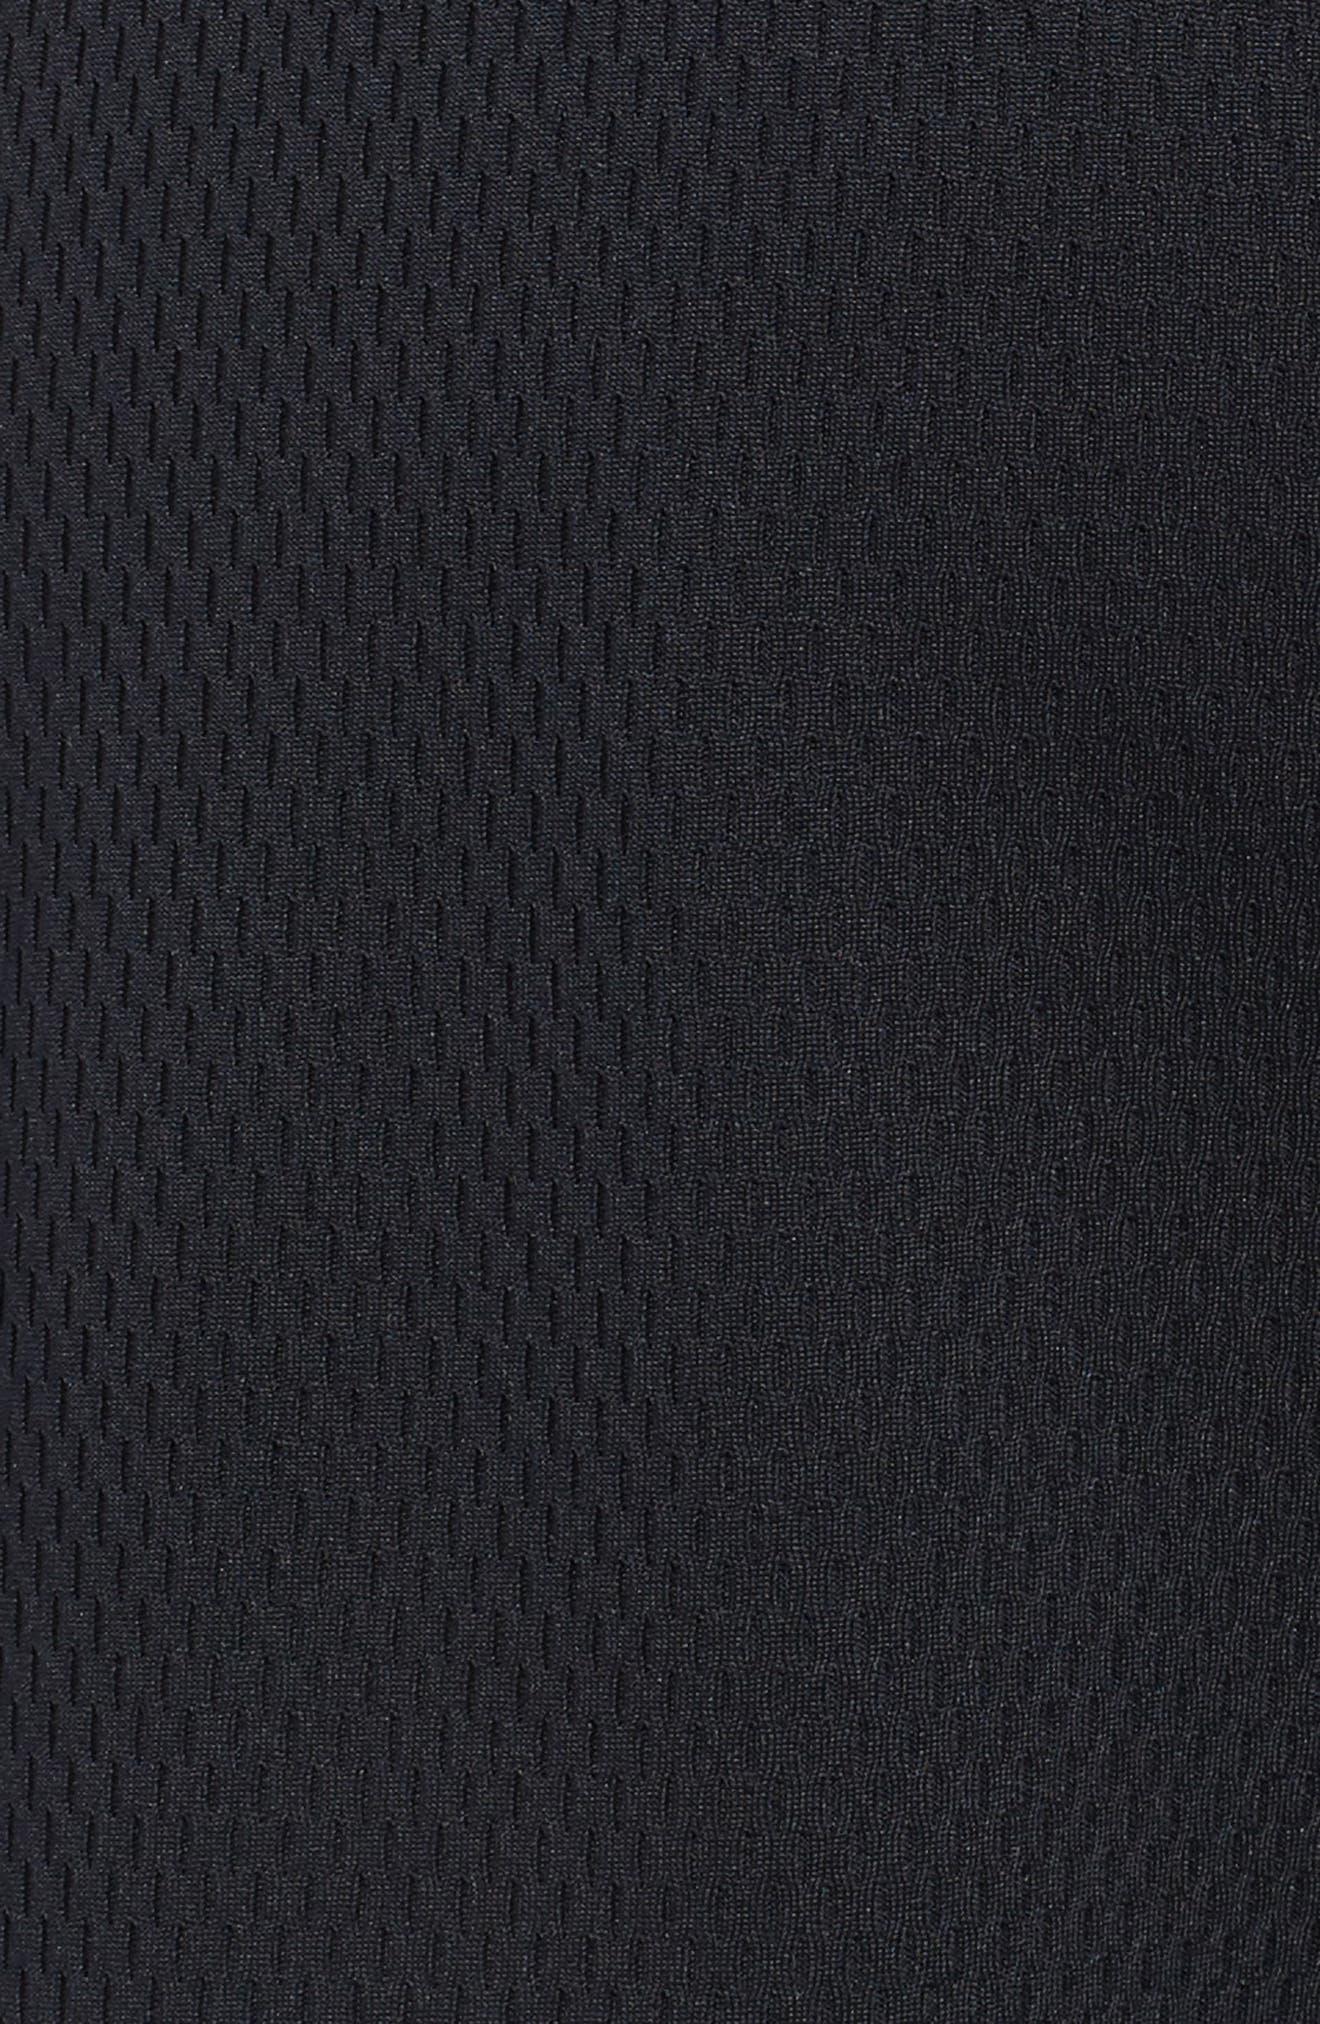 Training Dry 4.0 Shorts,                             Alternate thumbnail 5, color,                             010